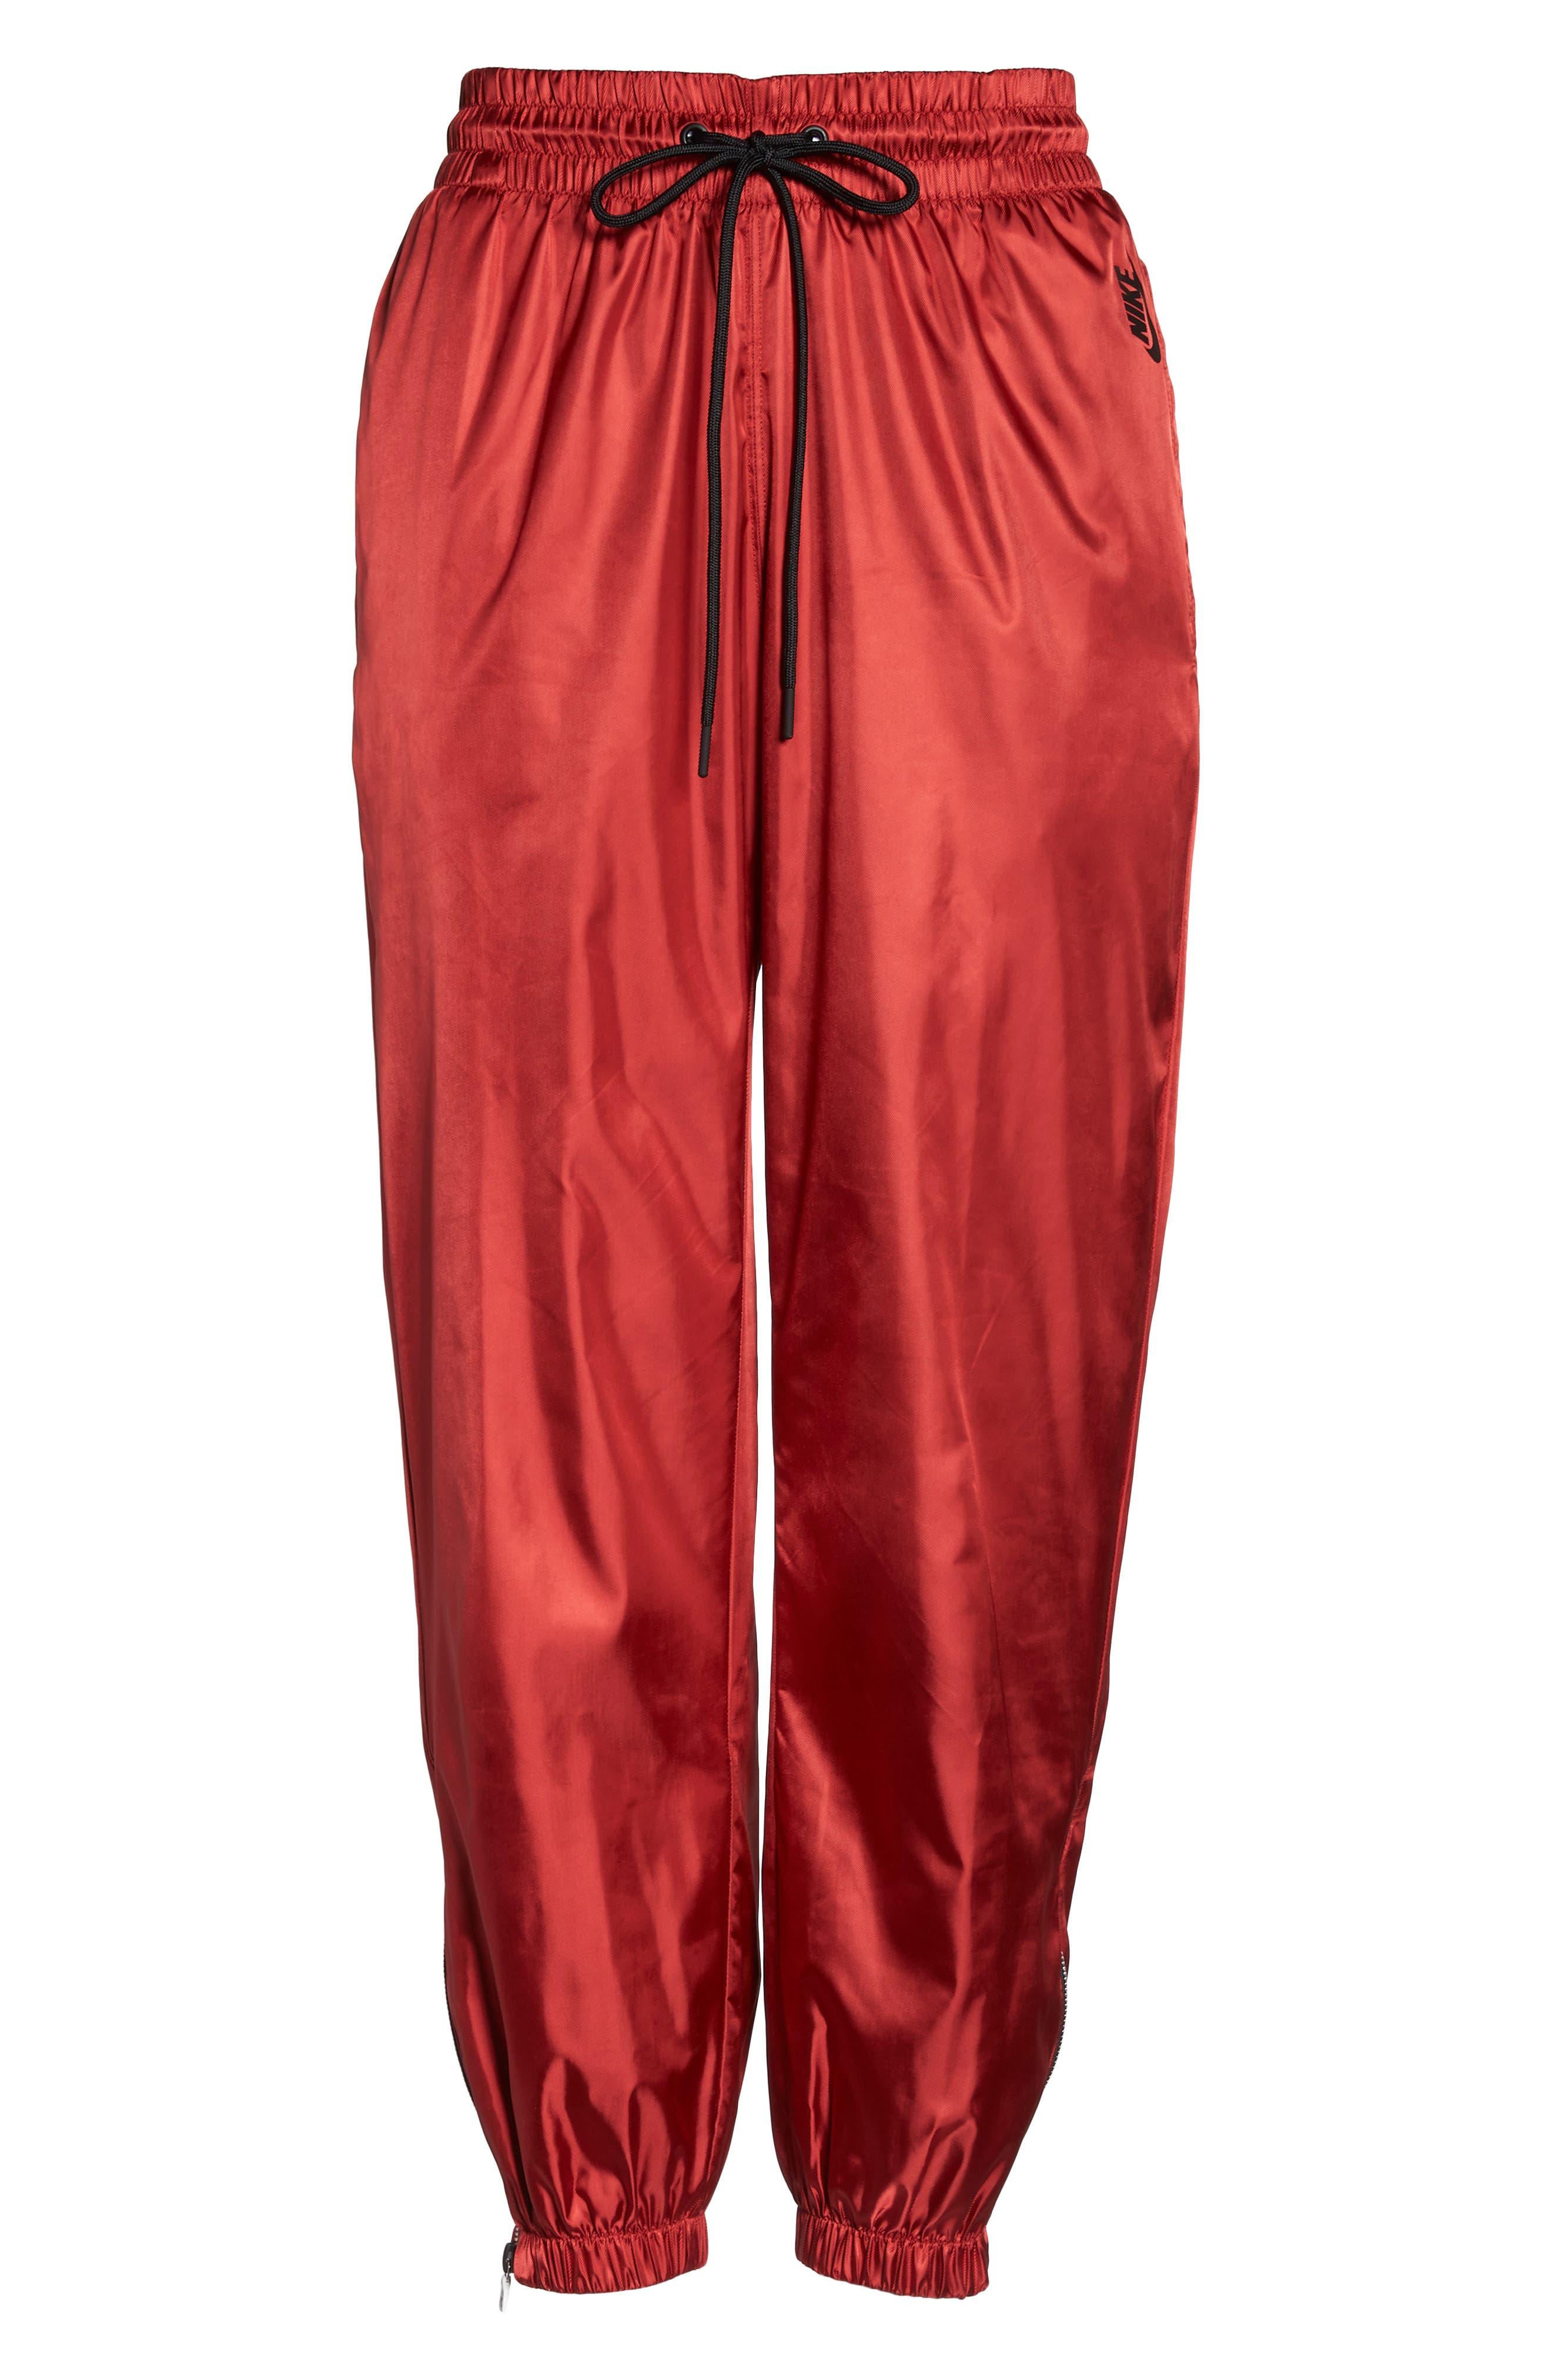 NikeLab Collection Women's Satin Track Pants,                             Alternate thumbnail 7, color,                             600